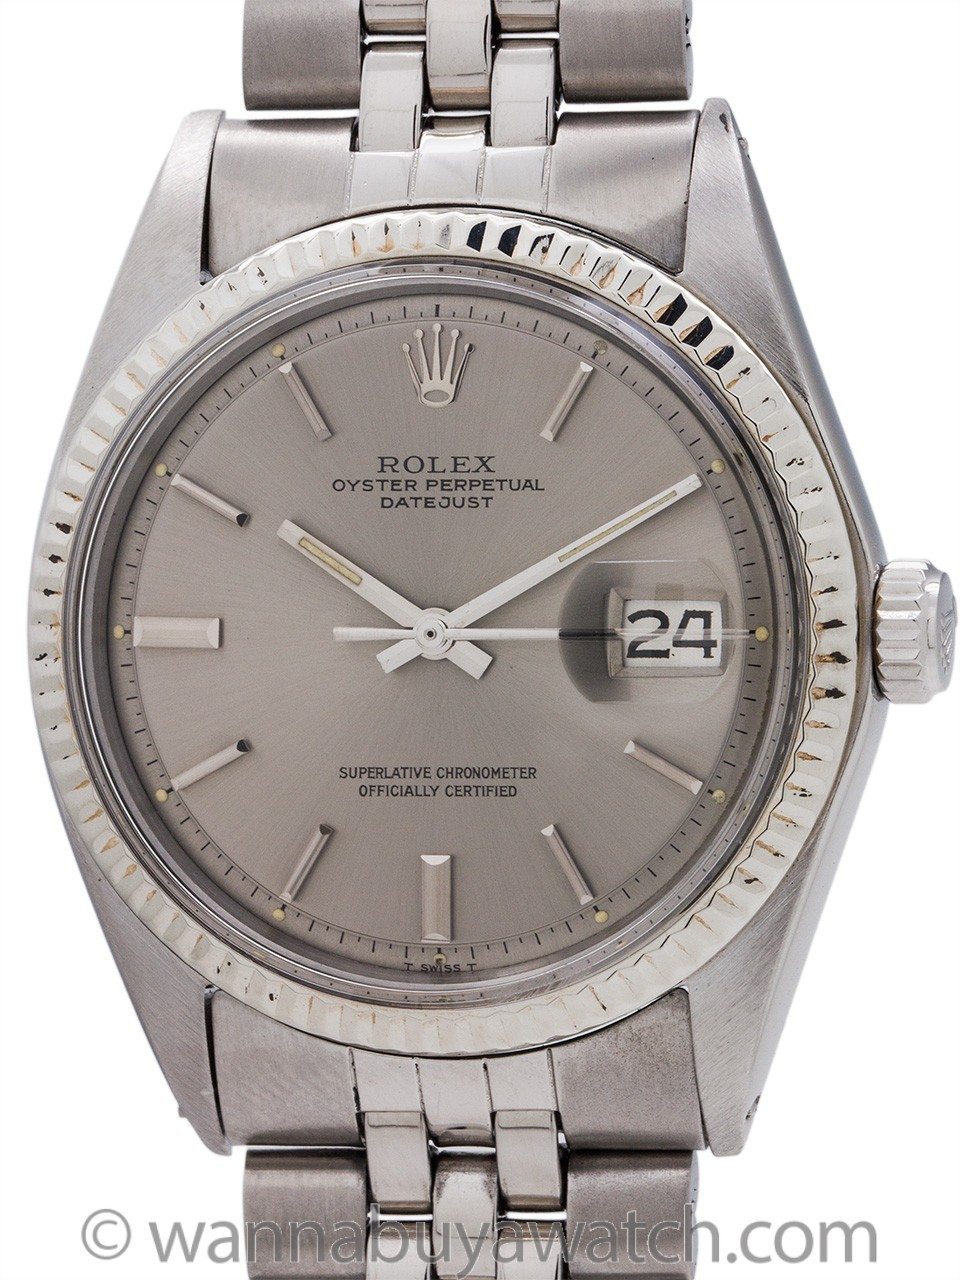 Rolex Datejust ref 1601 Stainless Steel Gray Pie Pan Dial circa 1972